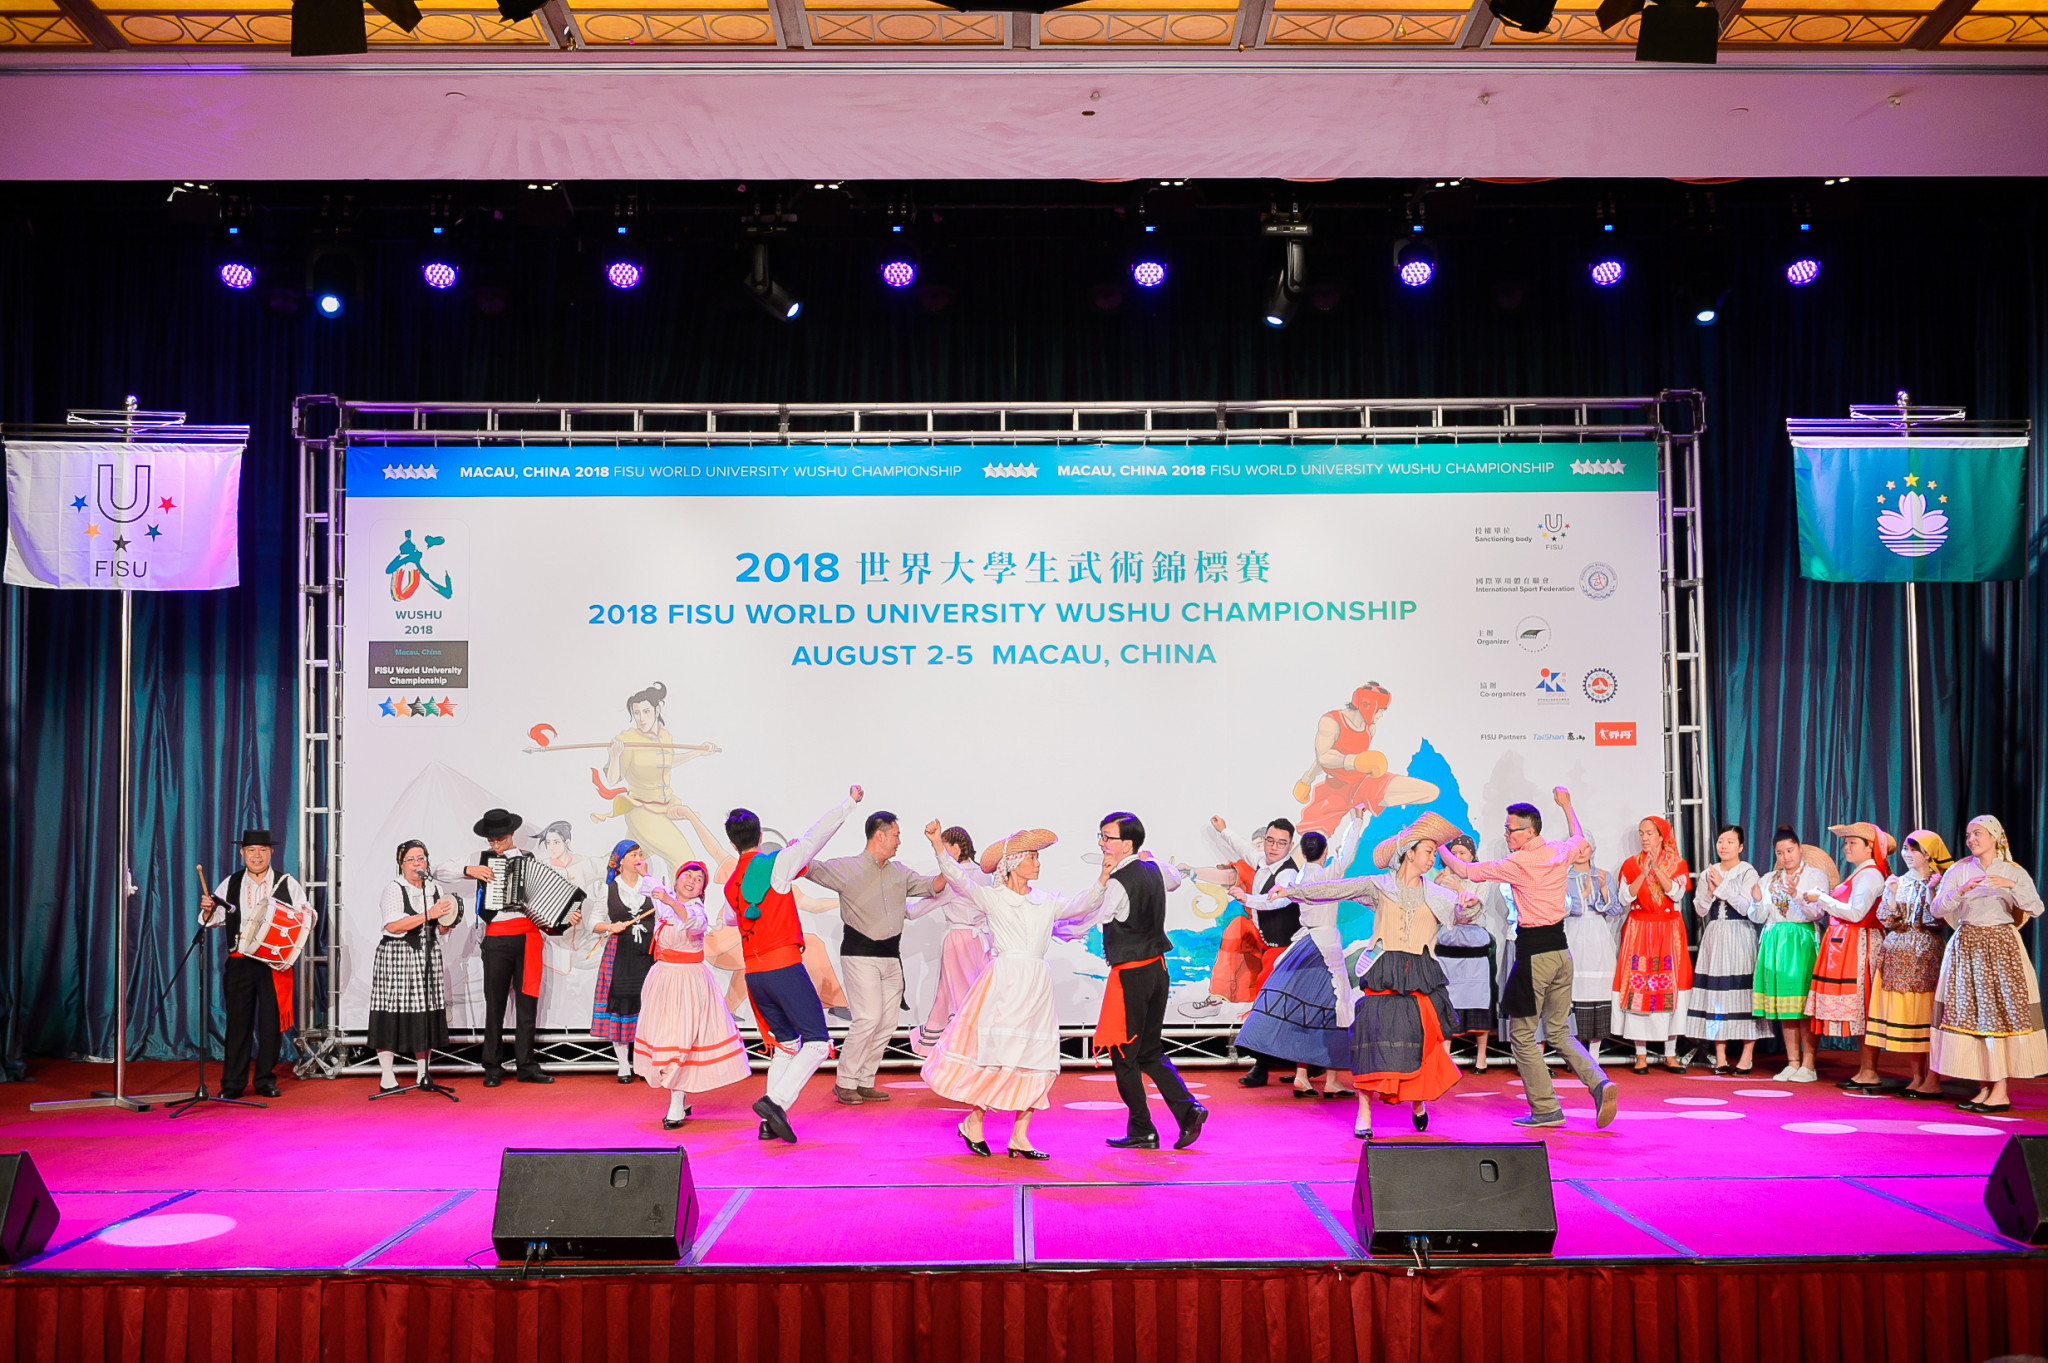 Double gold for Malaysia at World University Wushu Championships